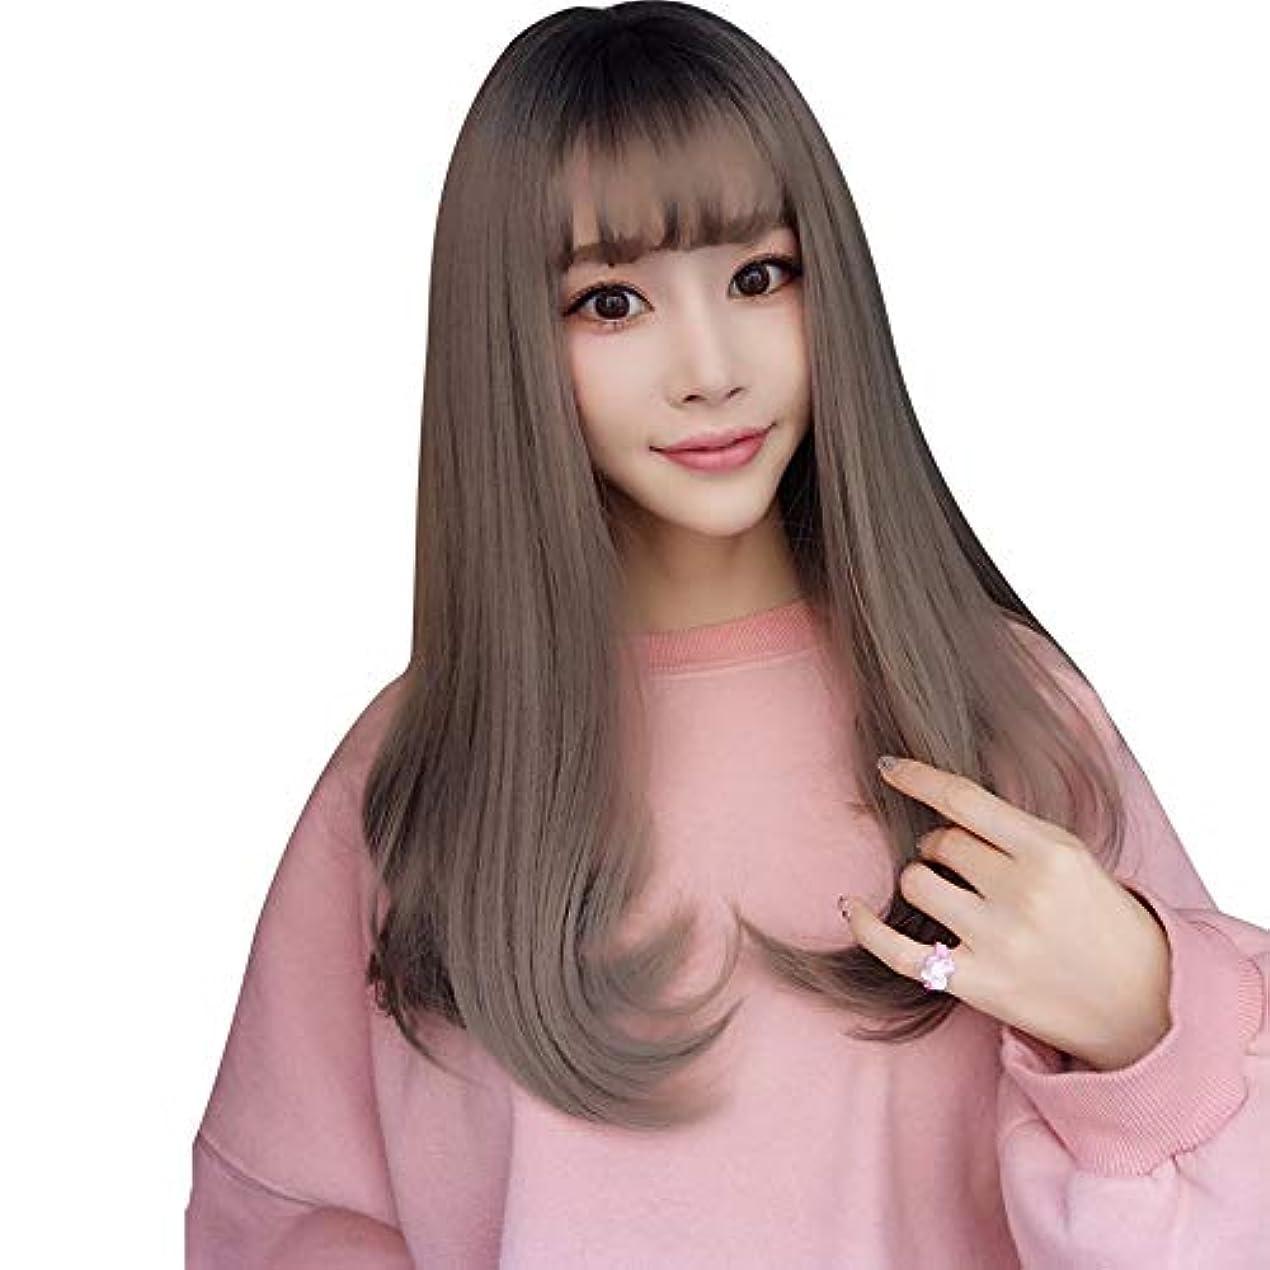 SRY-Wigファッション 20 ``長いウェーブのかかった色の髪のファッションかつら白人女性の自然な女性の髪の部分のための耐熱性合成かつら